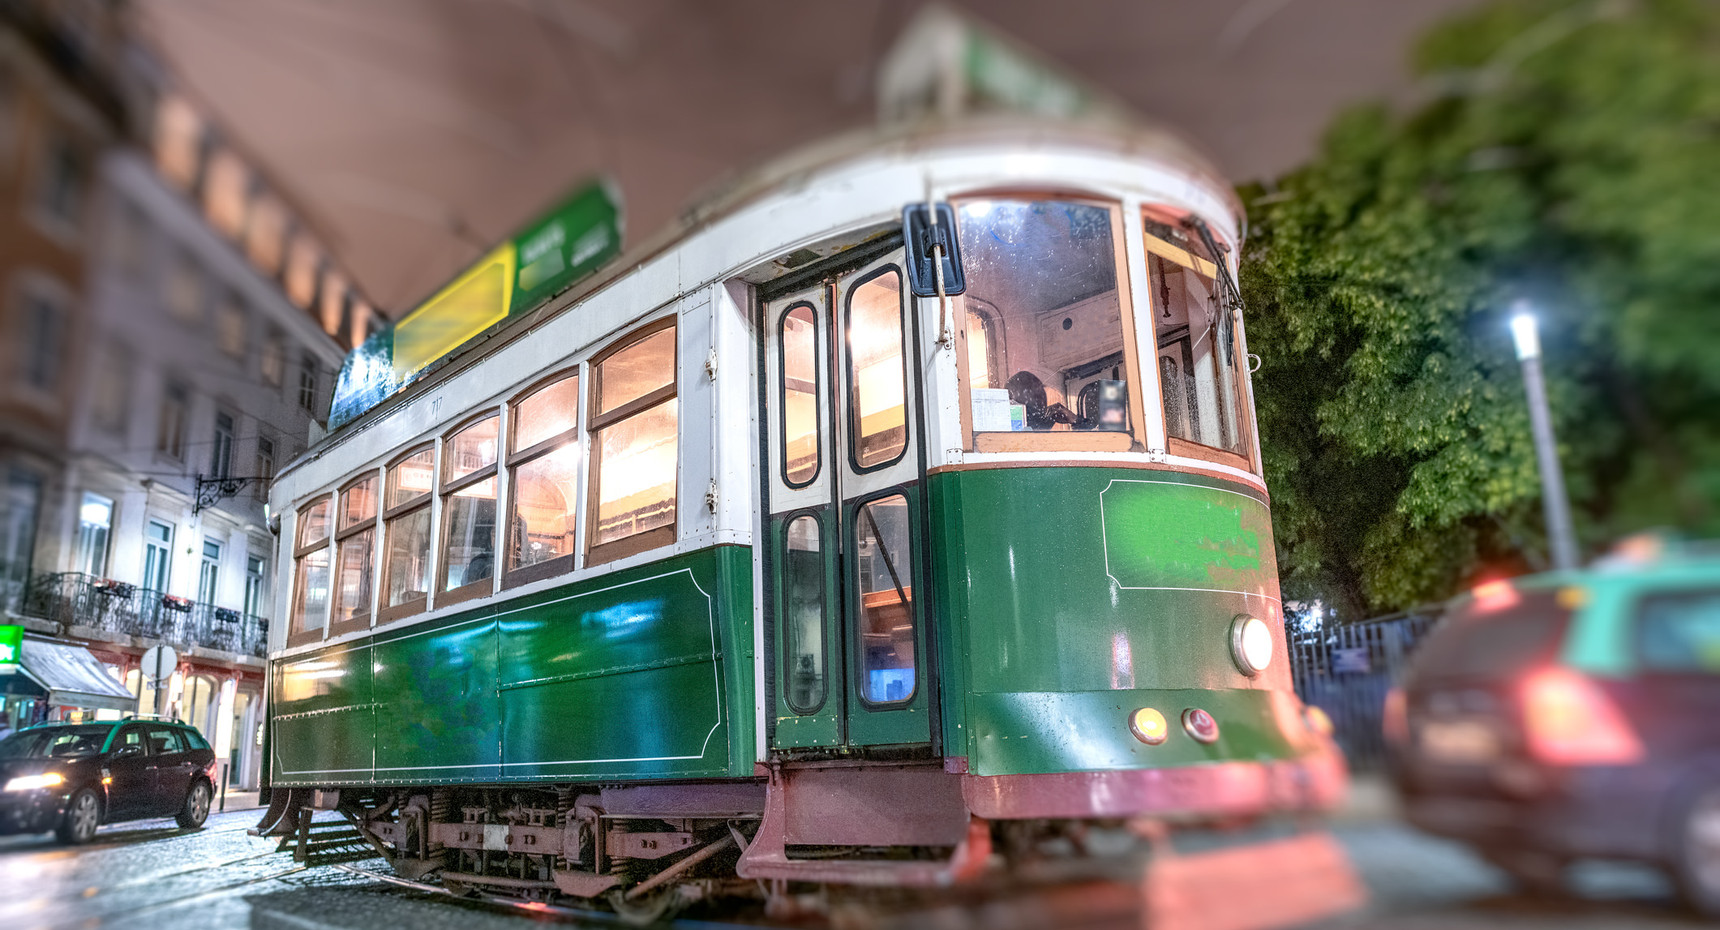 Old green city tram at night